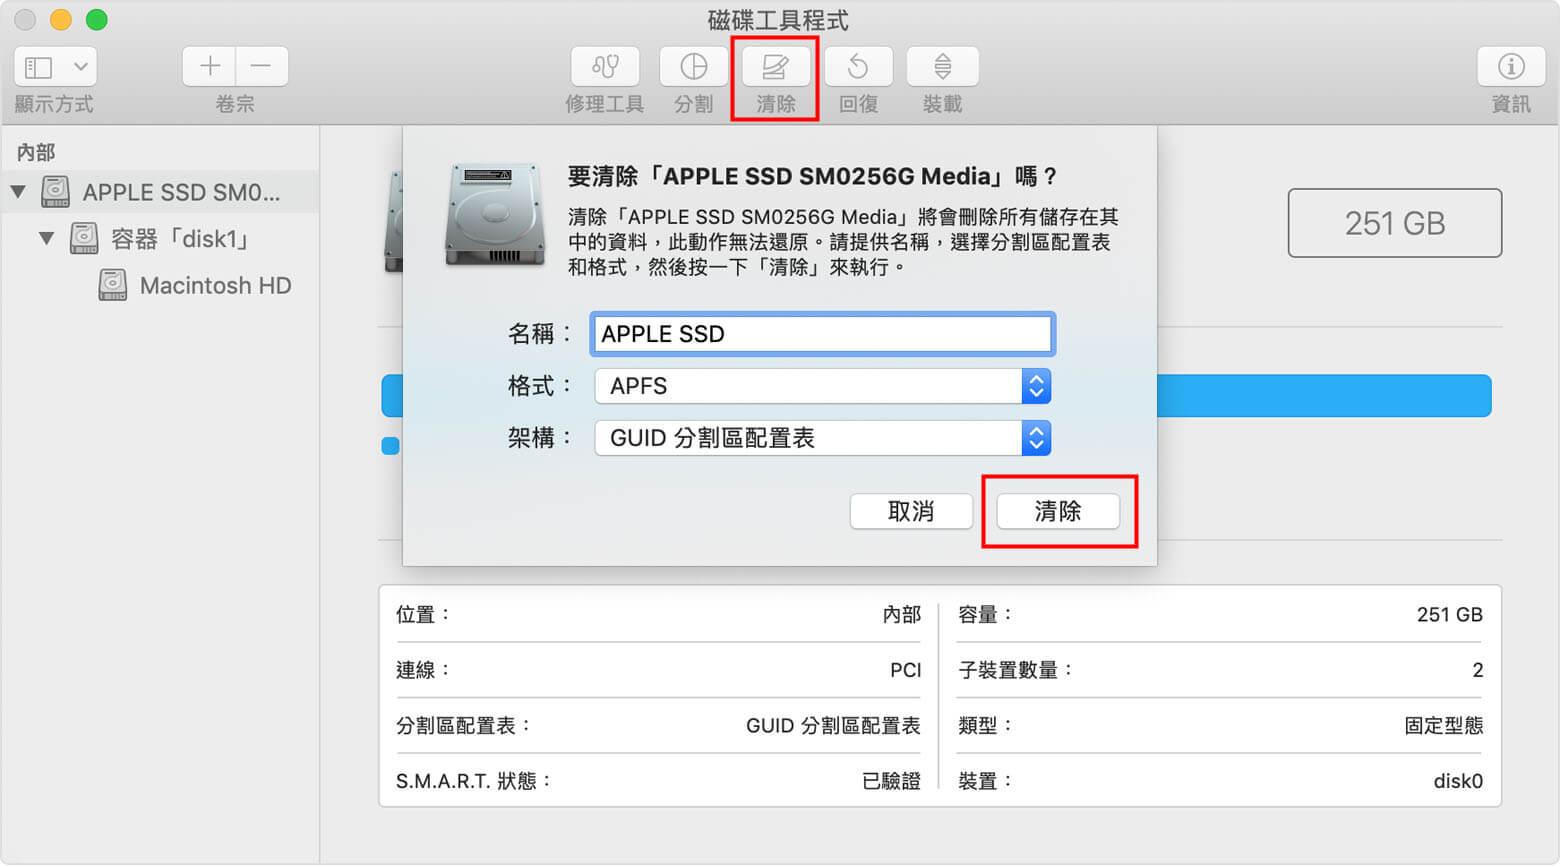 SD卡格式化方法及SD卡格式選擇 - 銳力電子實驗室